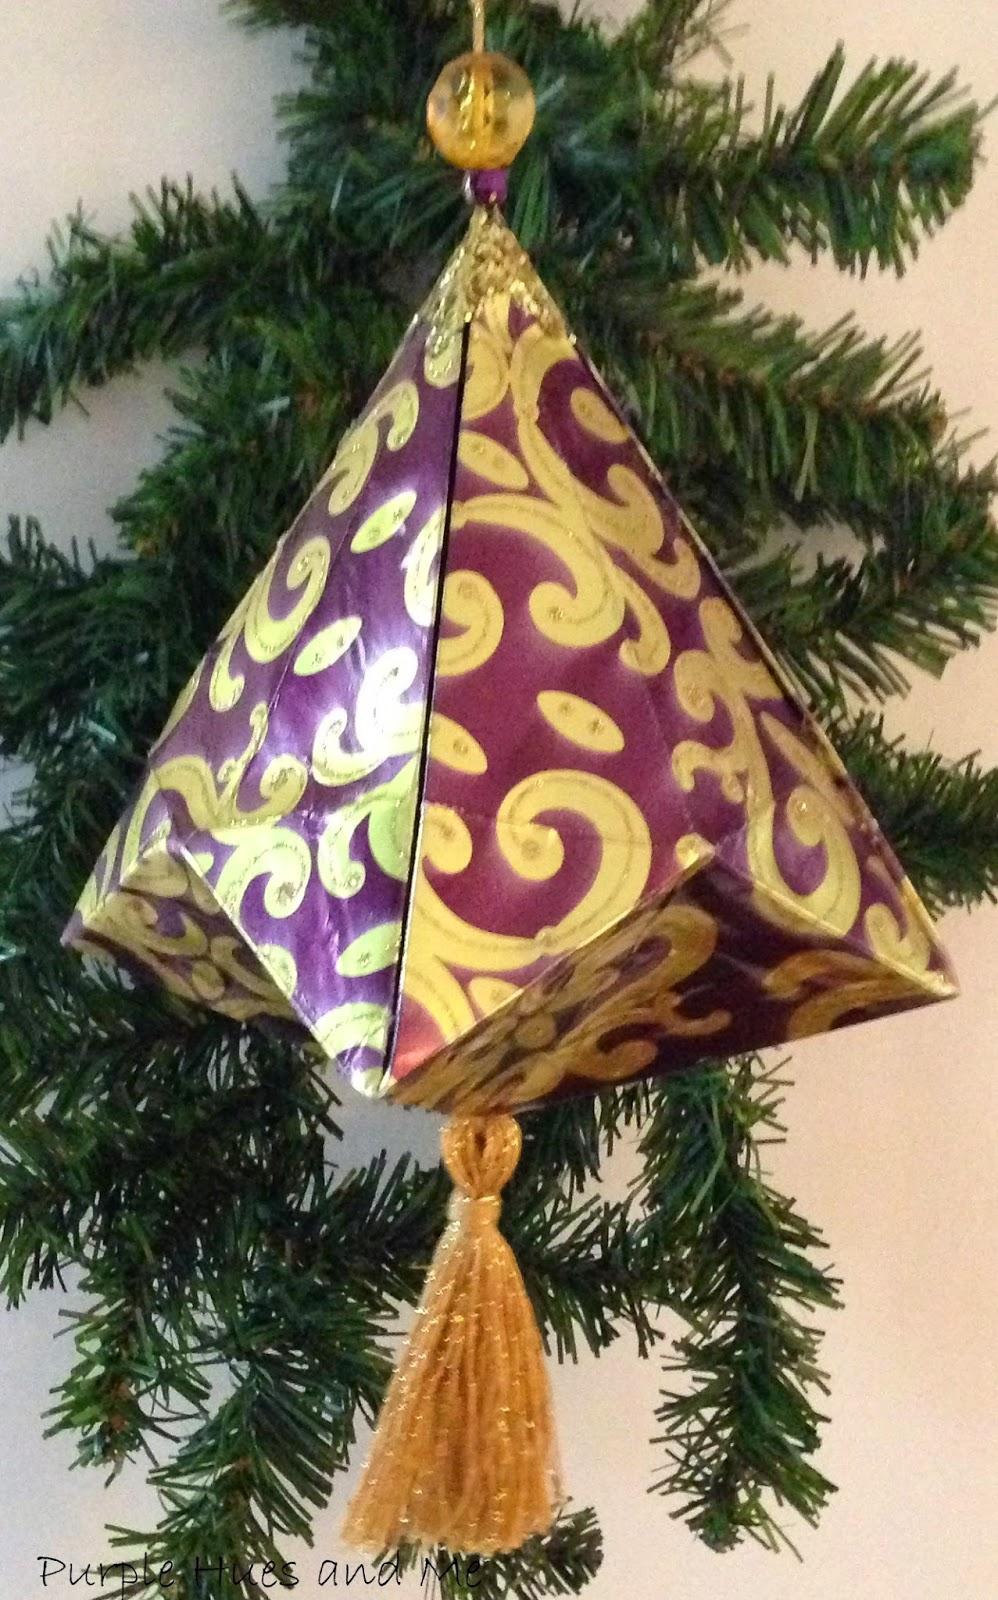 http://plumperfectandme.blogspot.com/2014/11/german-bell-christmas-ornament-tassel.html